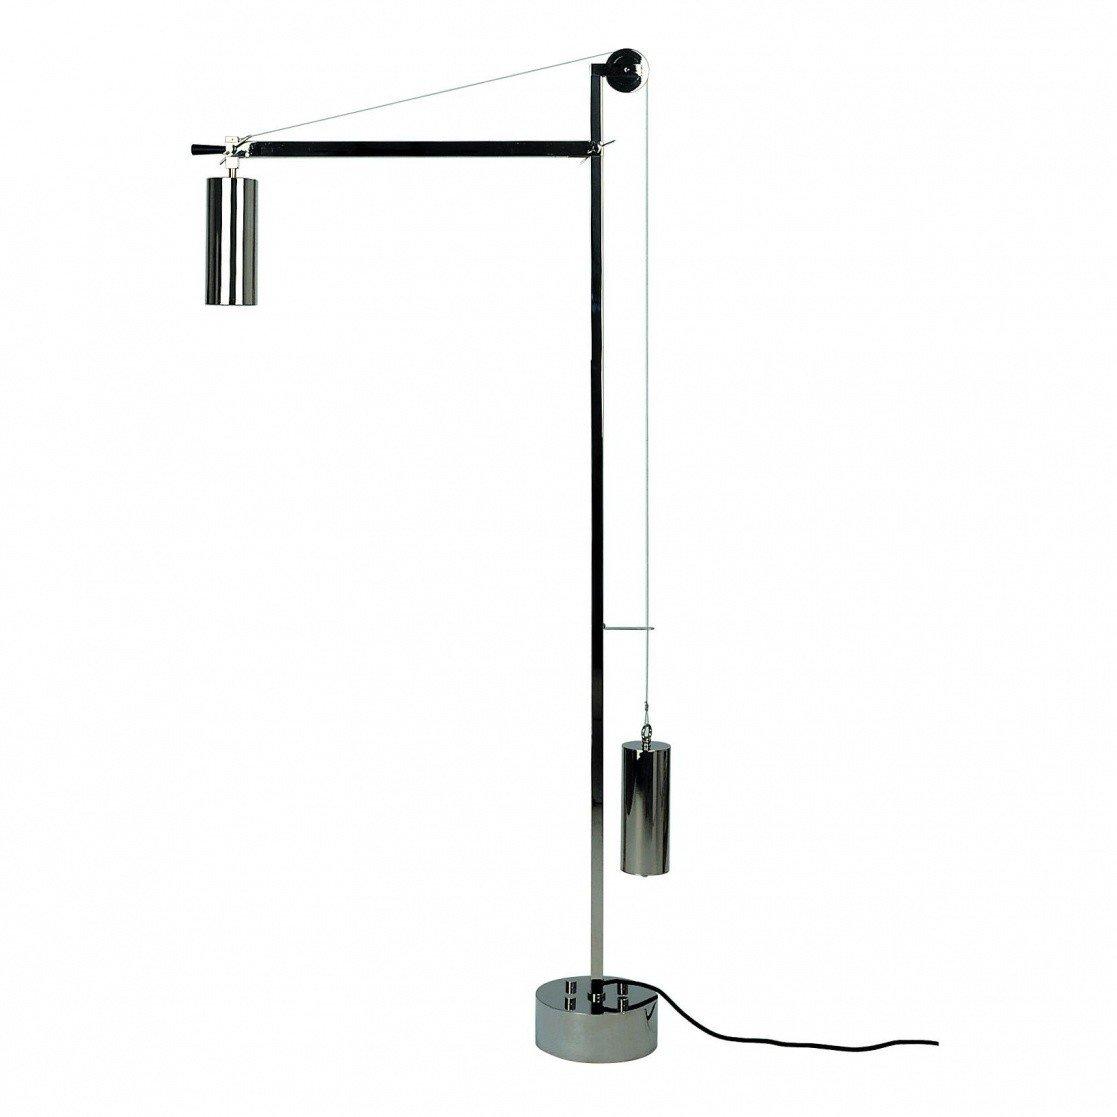 Eb 27 bauhaus floor lamp with counterbalance tecnolumen tecnolumen eb 27 bauhaus floor lamp with counterbalance aloadofball Images